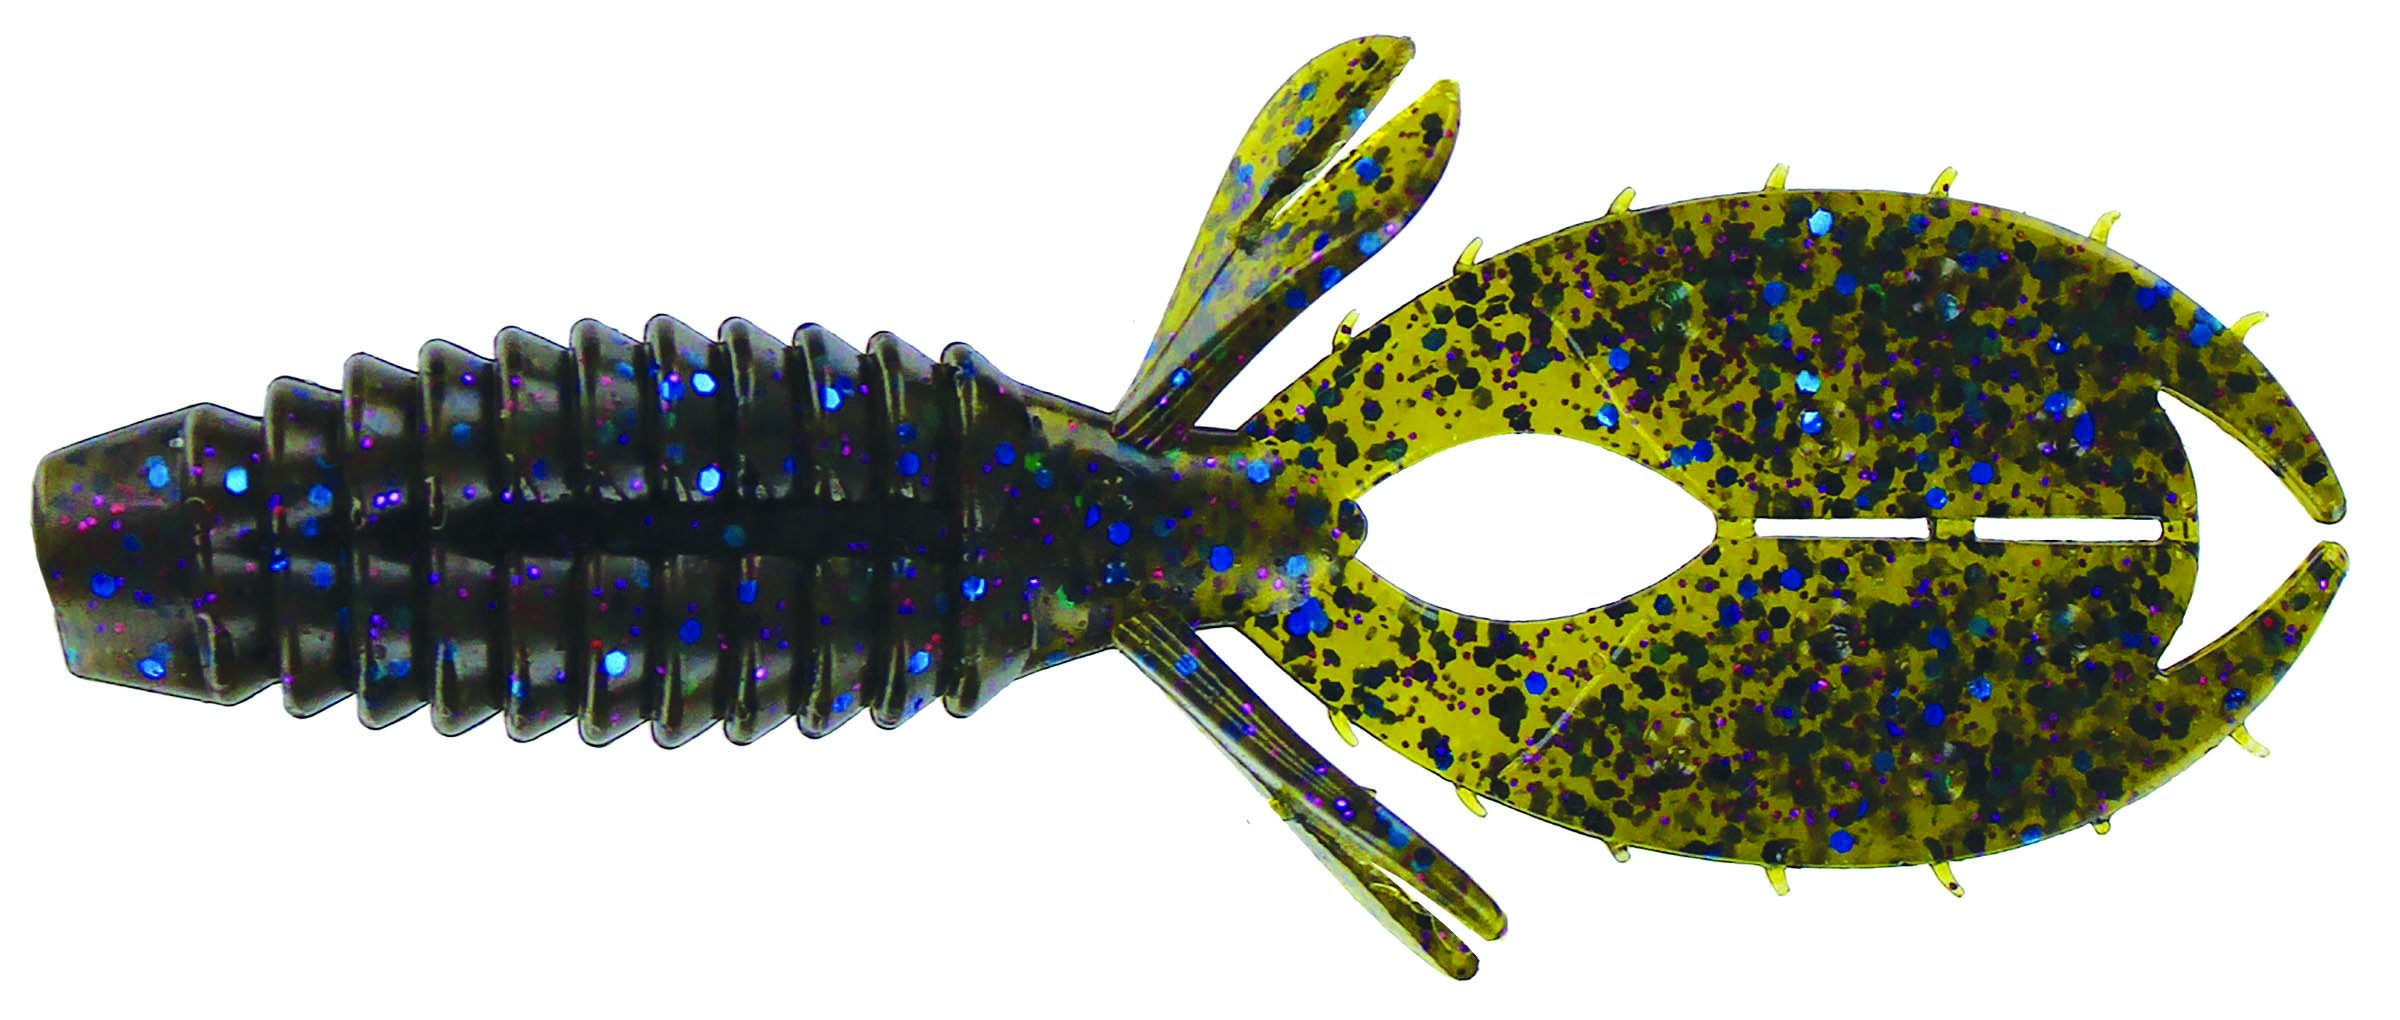 Big Bite Baits - YoMama - 4 inch - YO421 - TILAPIA